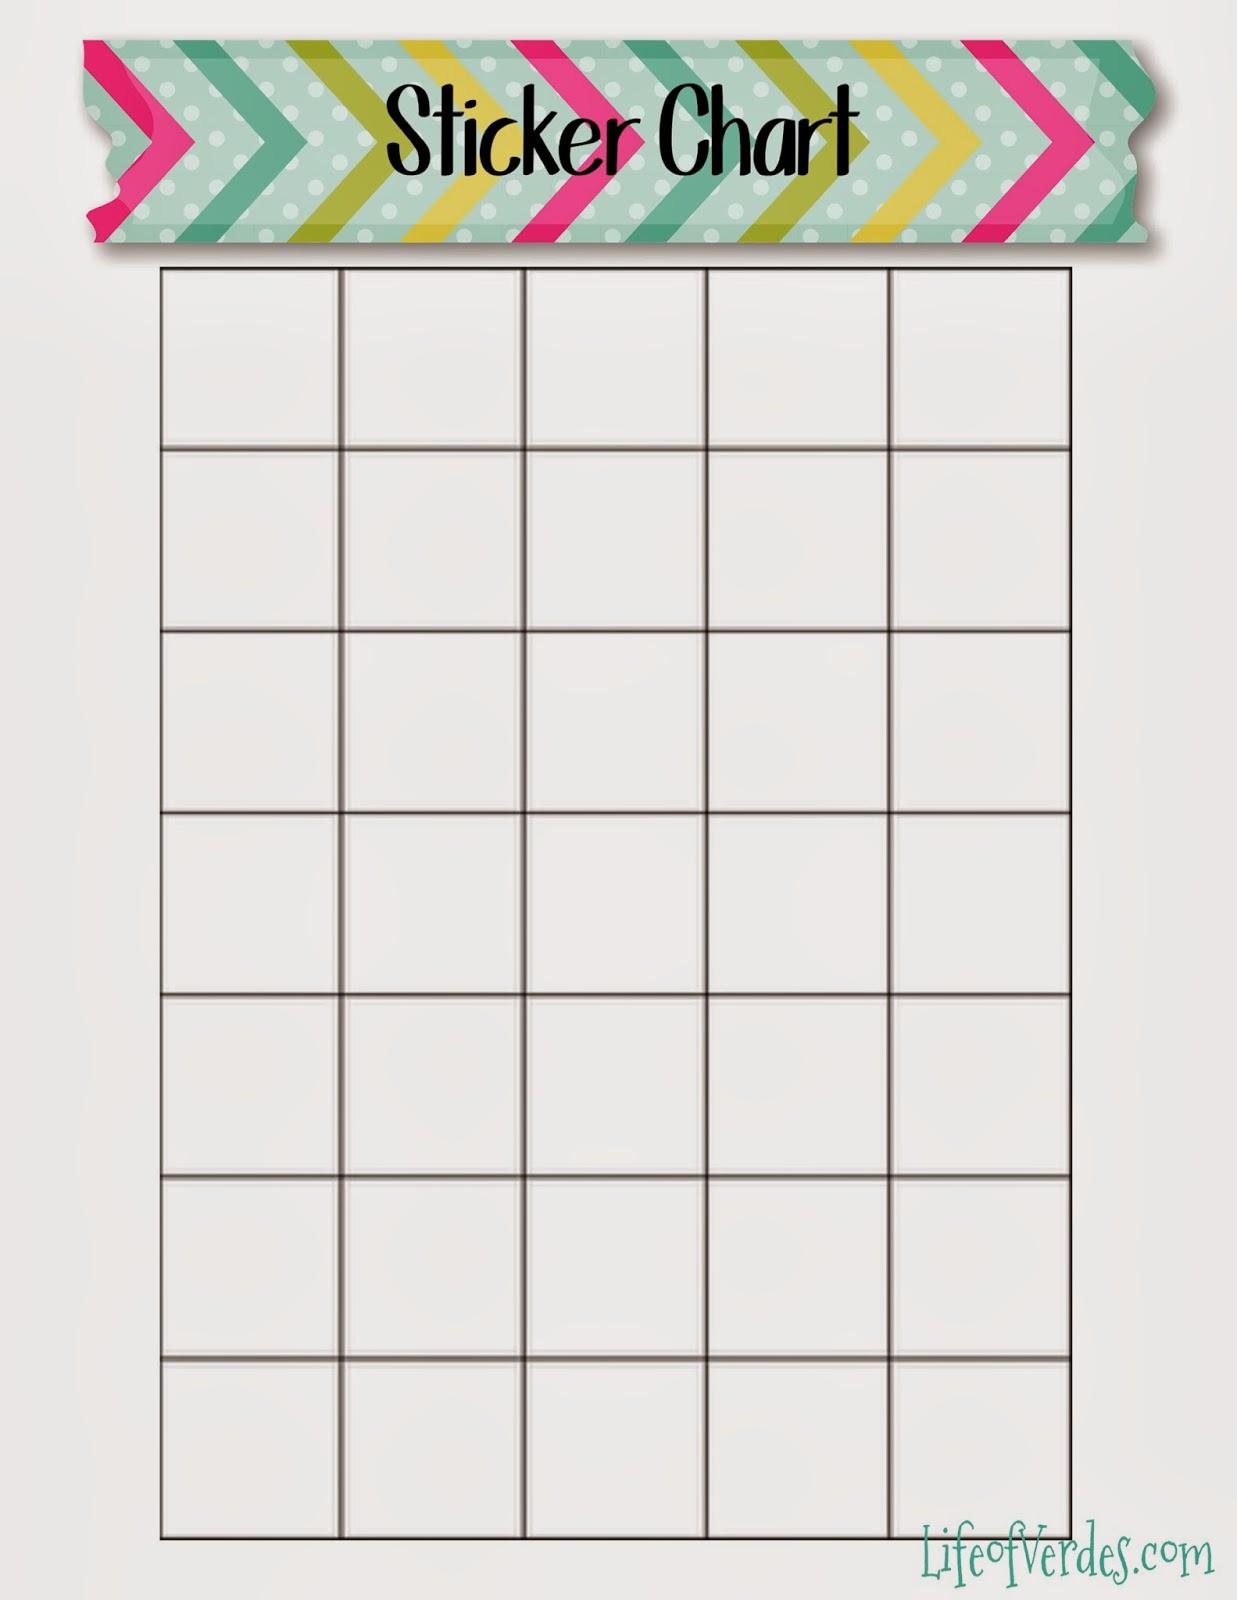 Life Of Verde'S : Free Washi Tape Themed Preschool Printables!